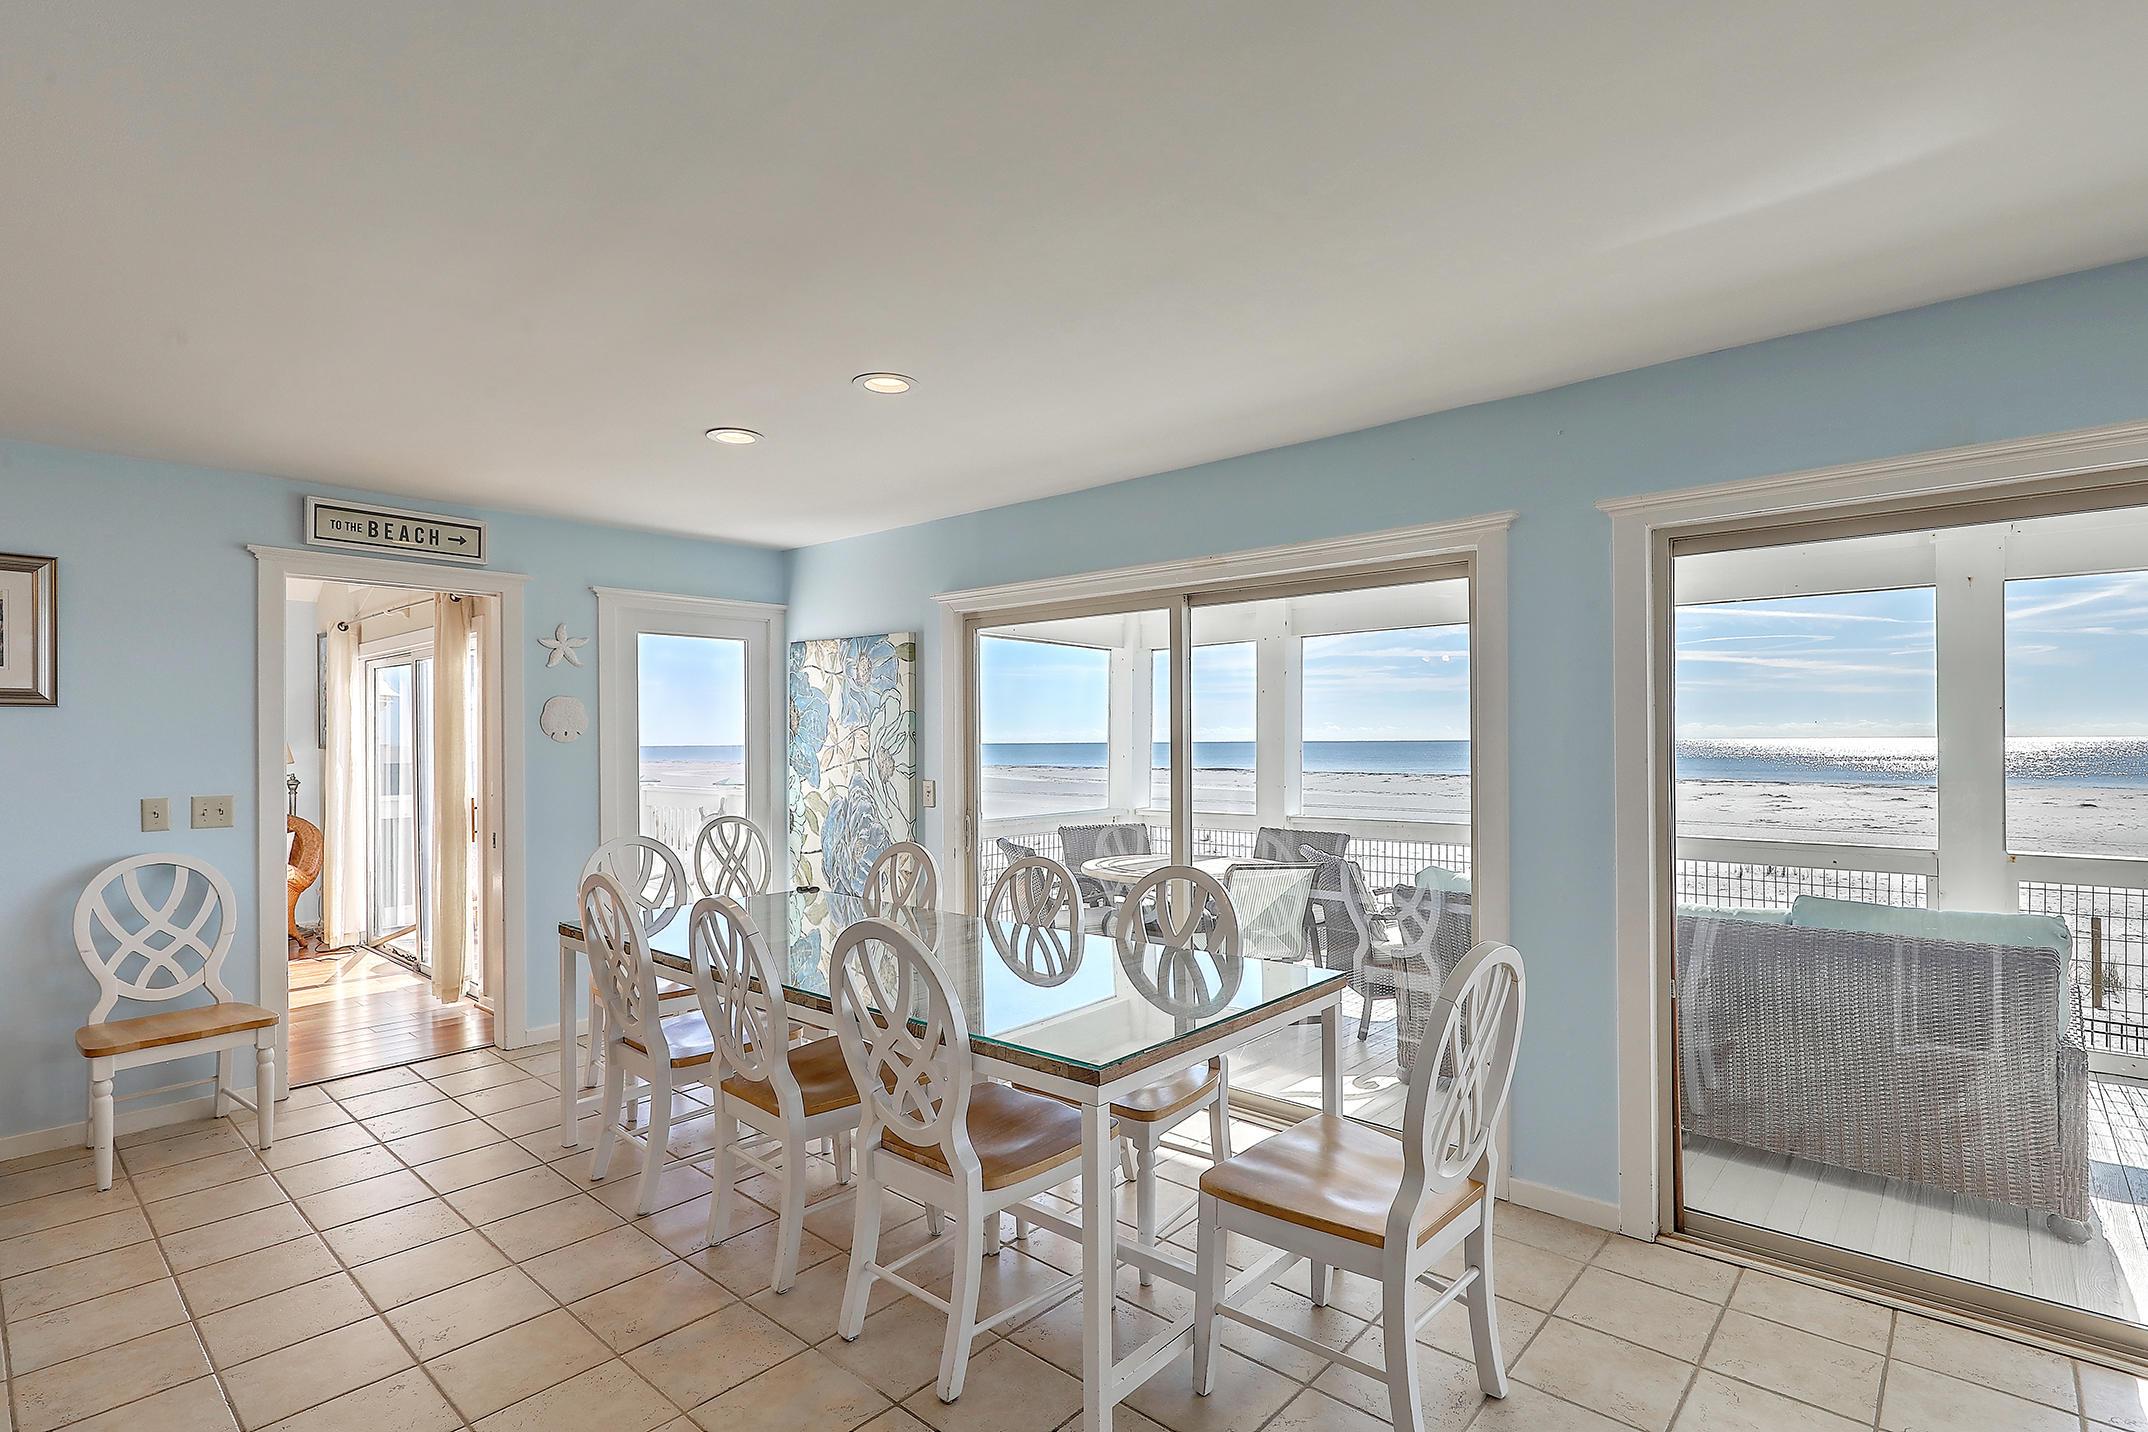 Wild Dunes Homes For Sale - 14 Beachwood East, Isle of Palms, SC - 17